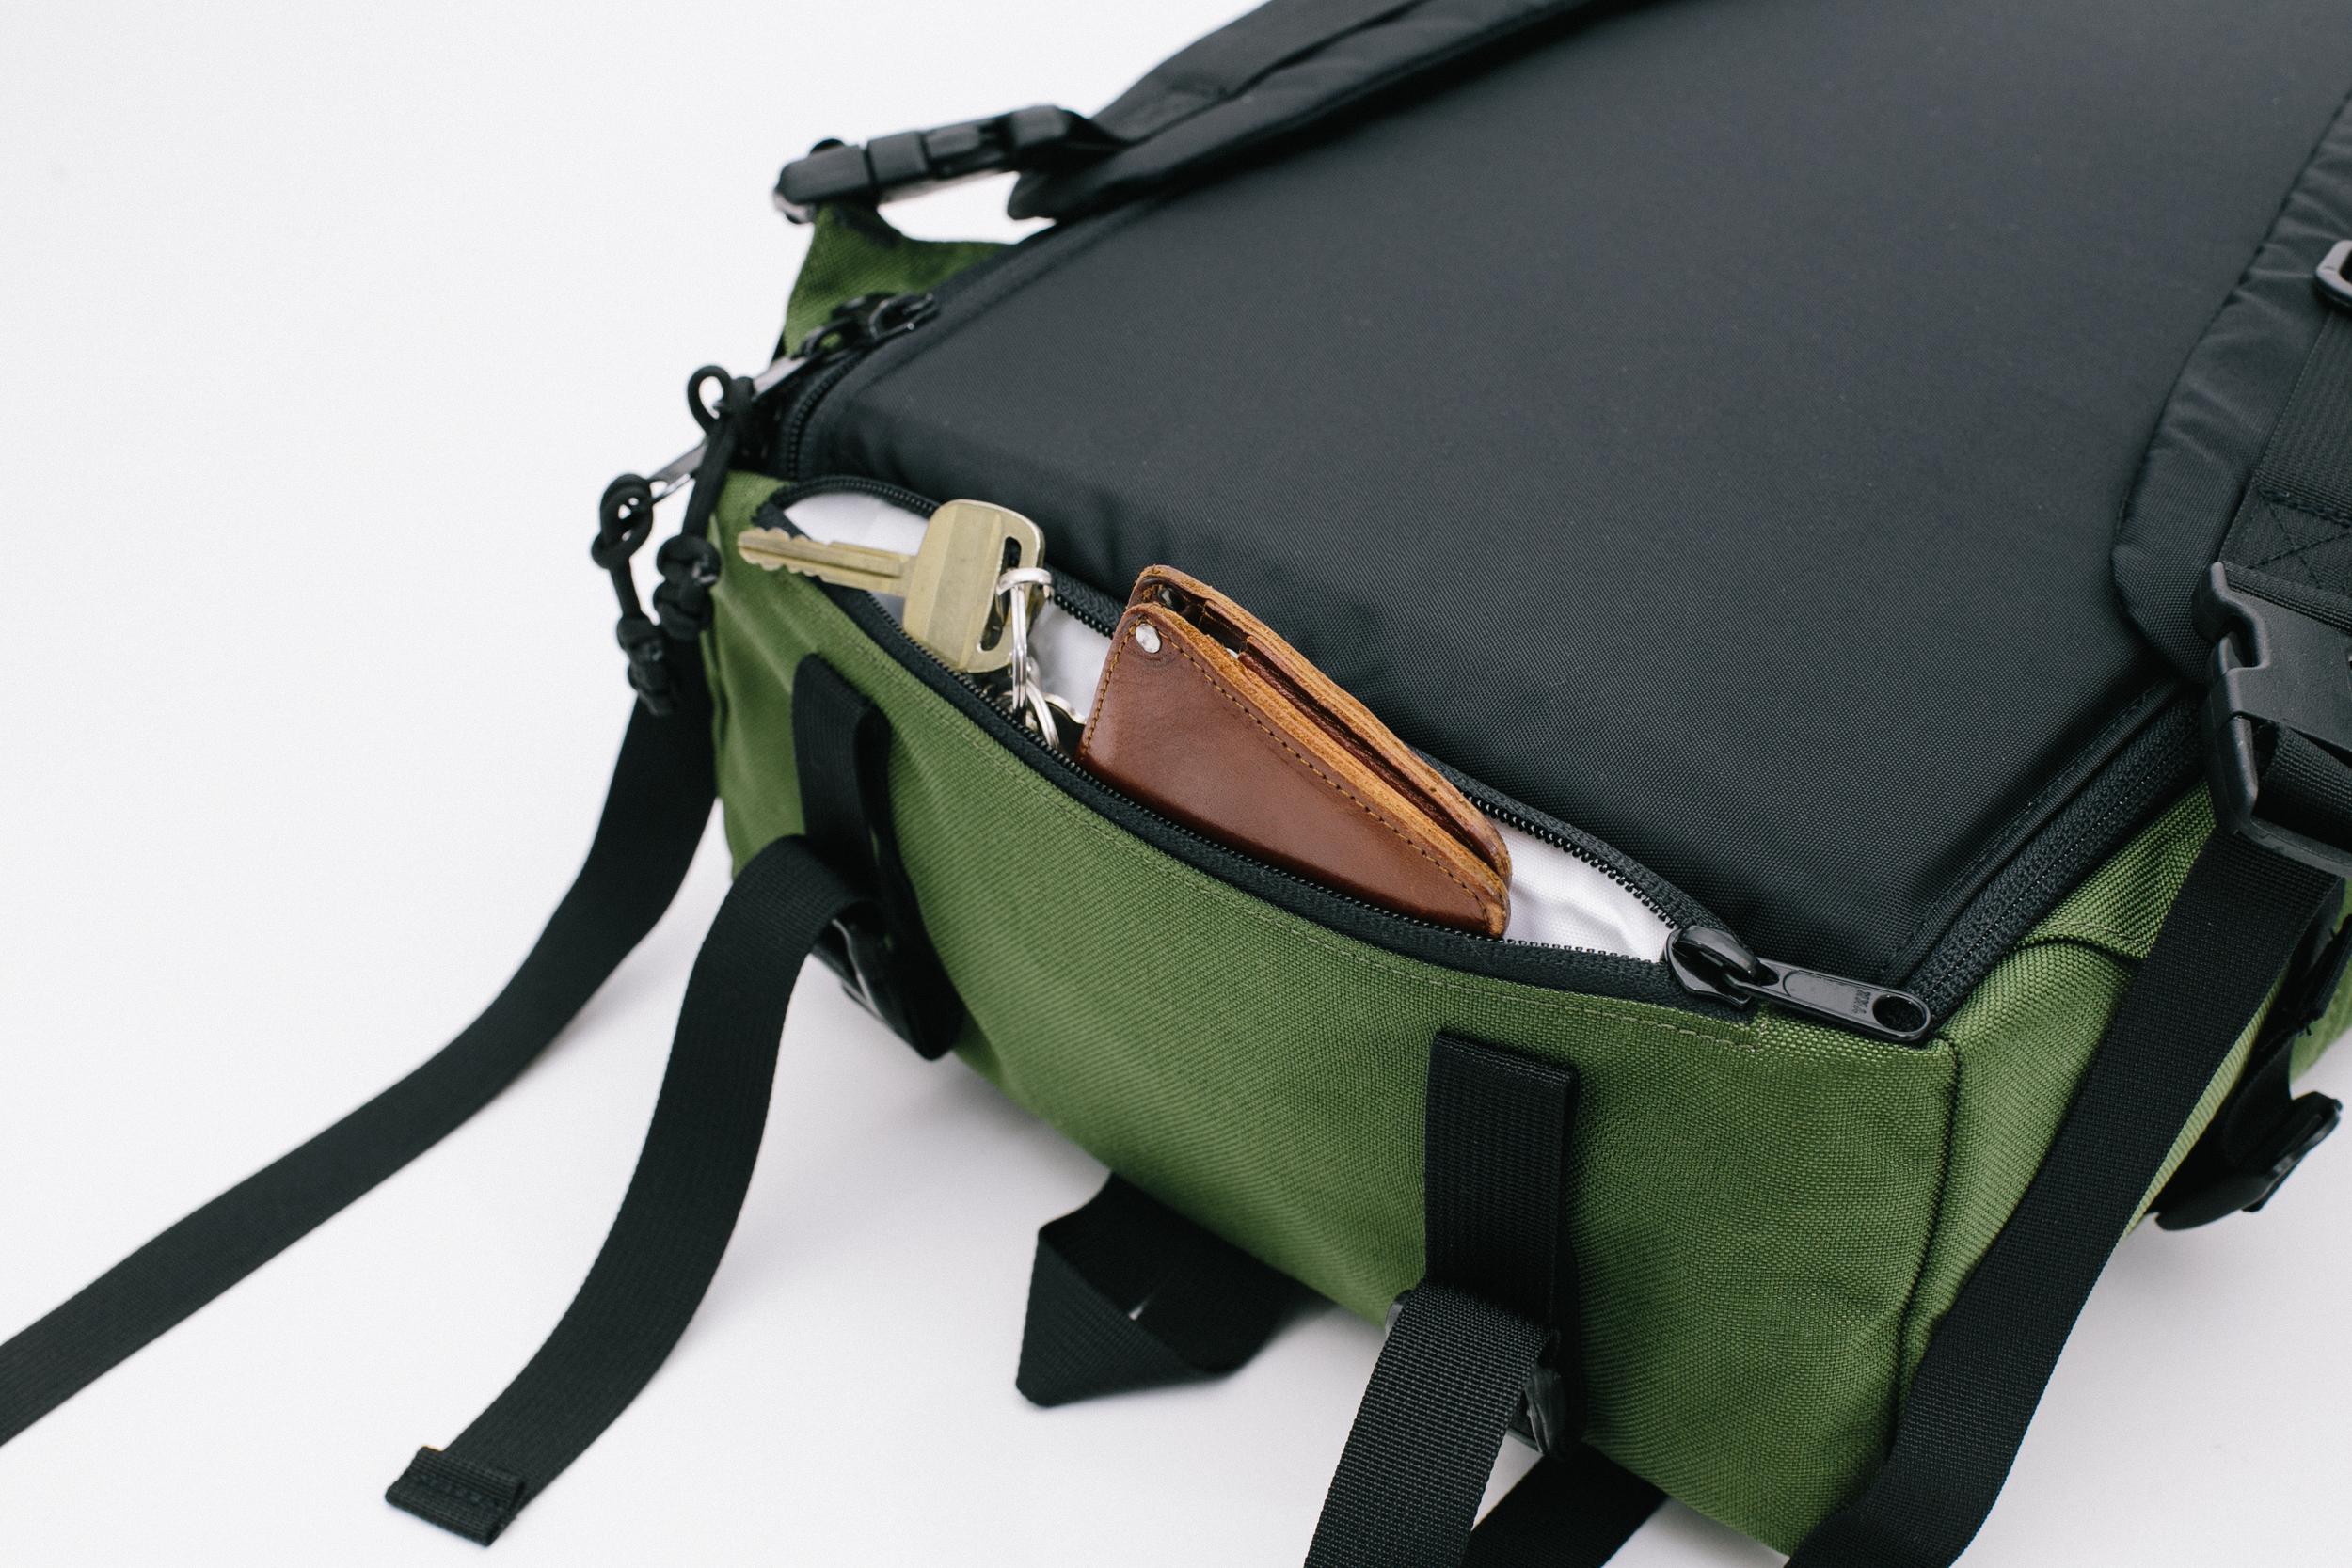 Bottom secret compartment for valuables